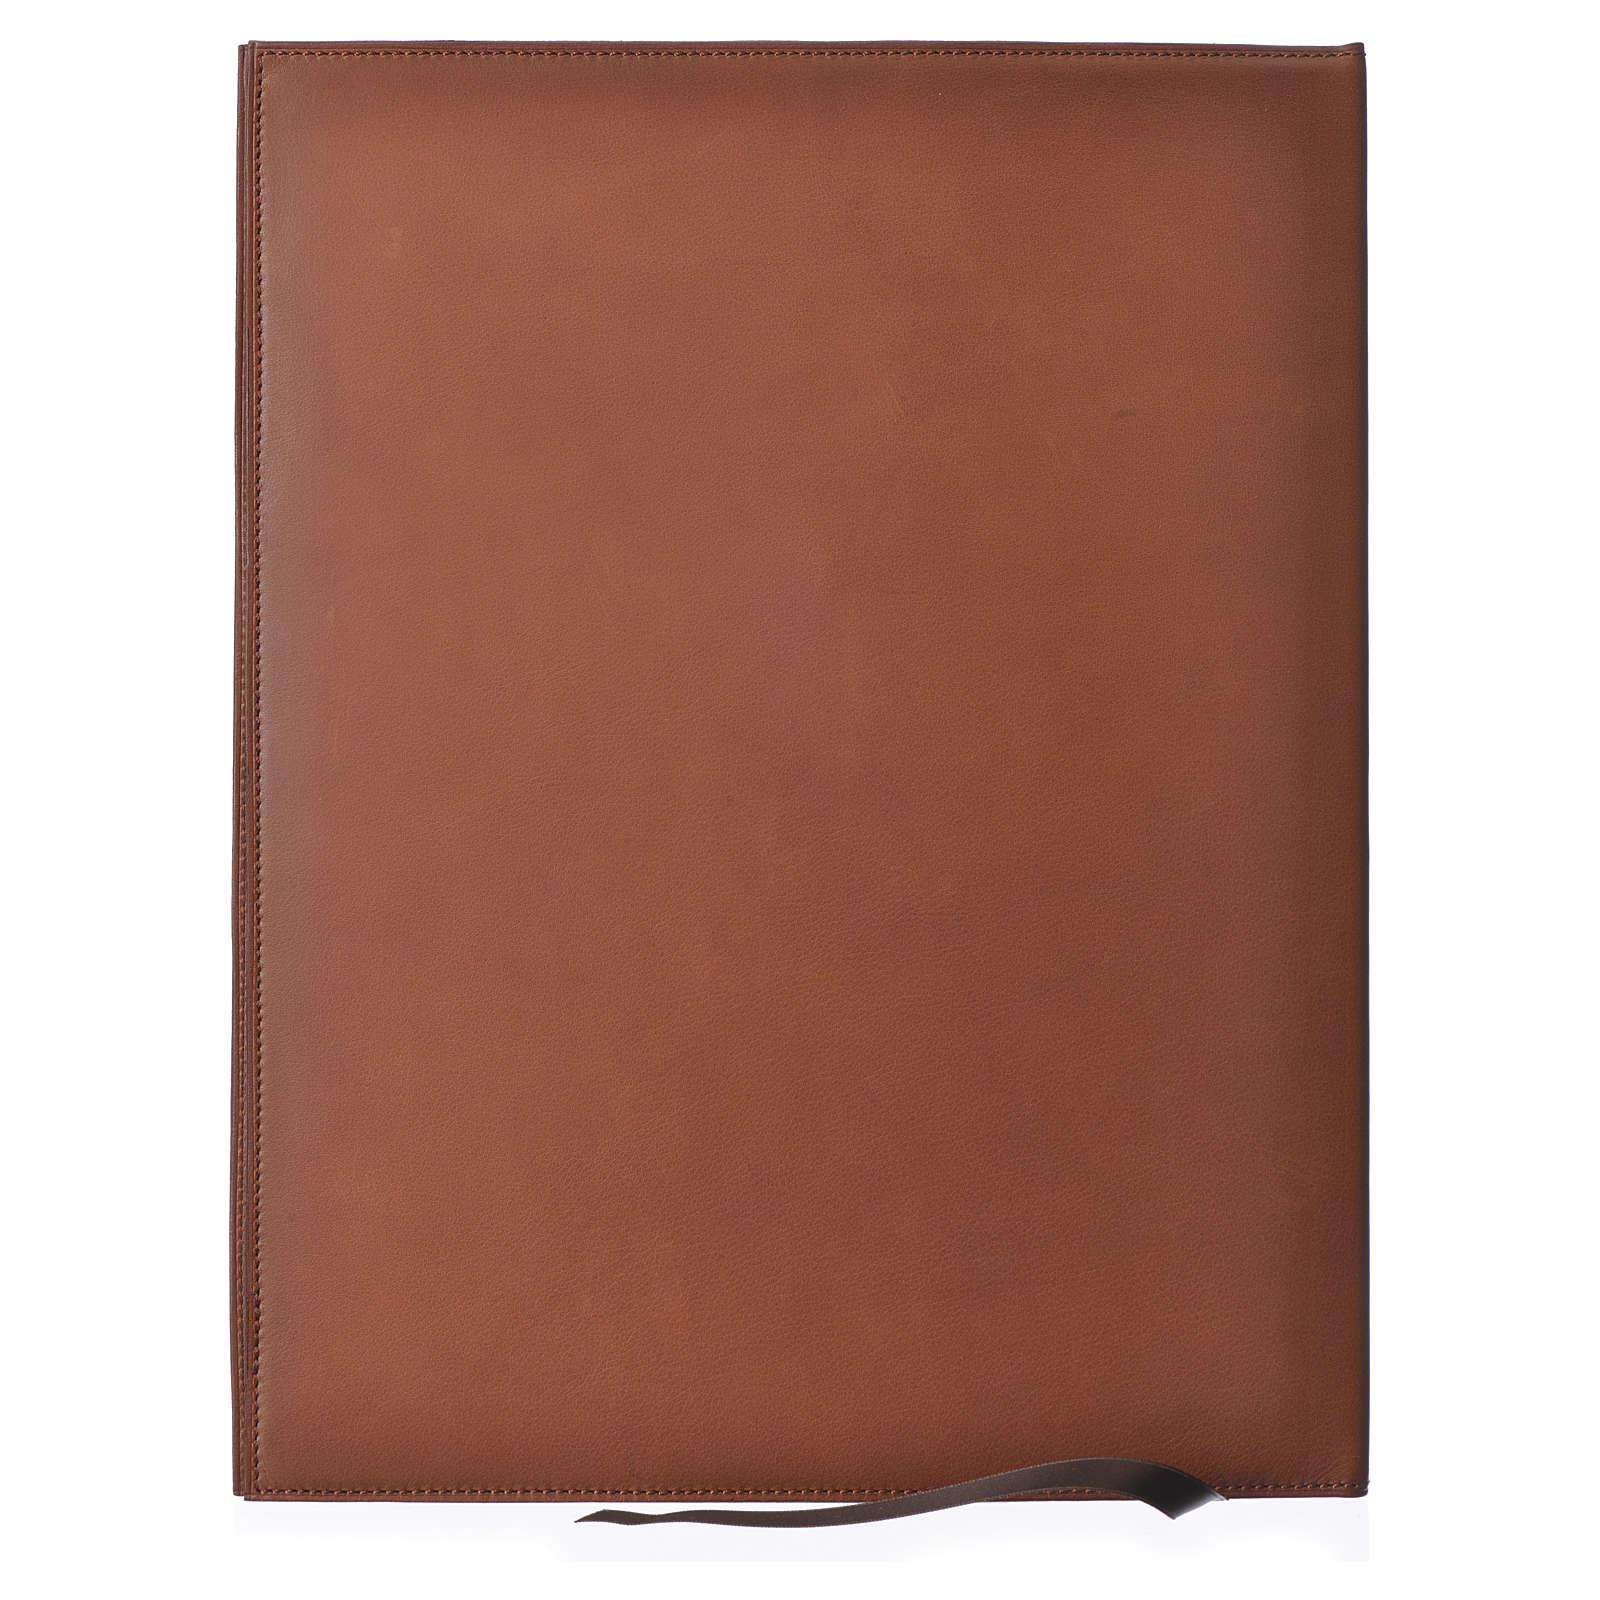 Folder for sacred rites in brown leather, hot pressed golden lamb Bethleem, A4 size 4